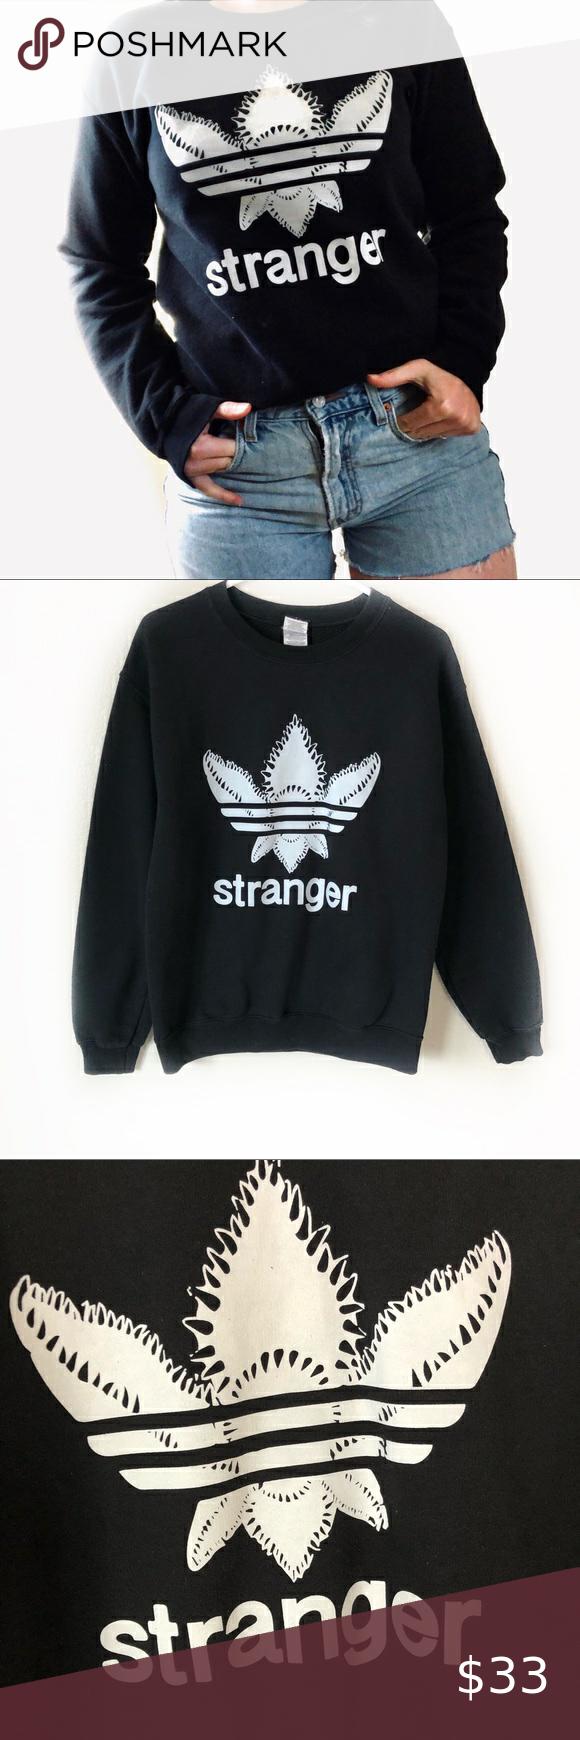 Stranger Things Adidas Sweatshirt Sz S Adidas Sweatshirt Sweatshirts Clothes Design [ 1740 x 580 Pixel ]